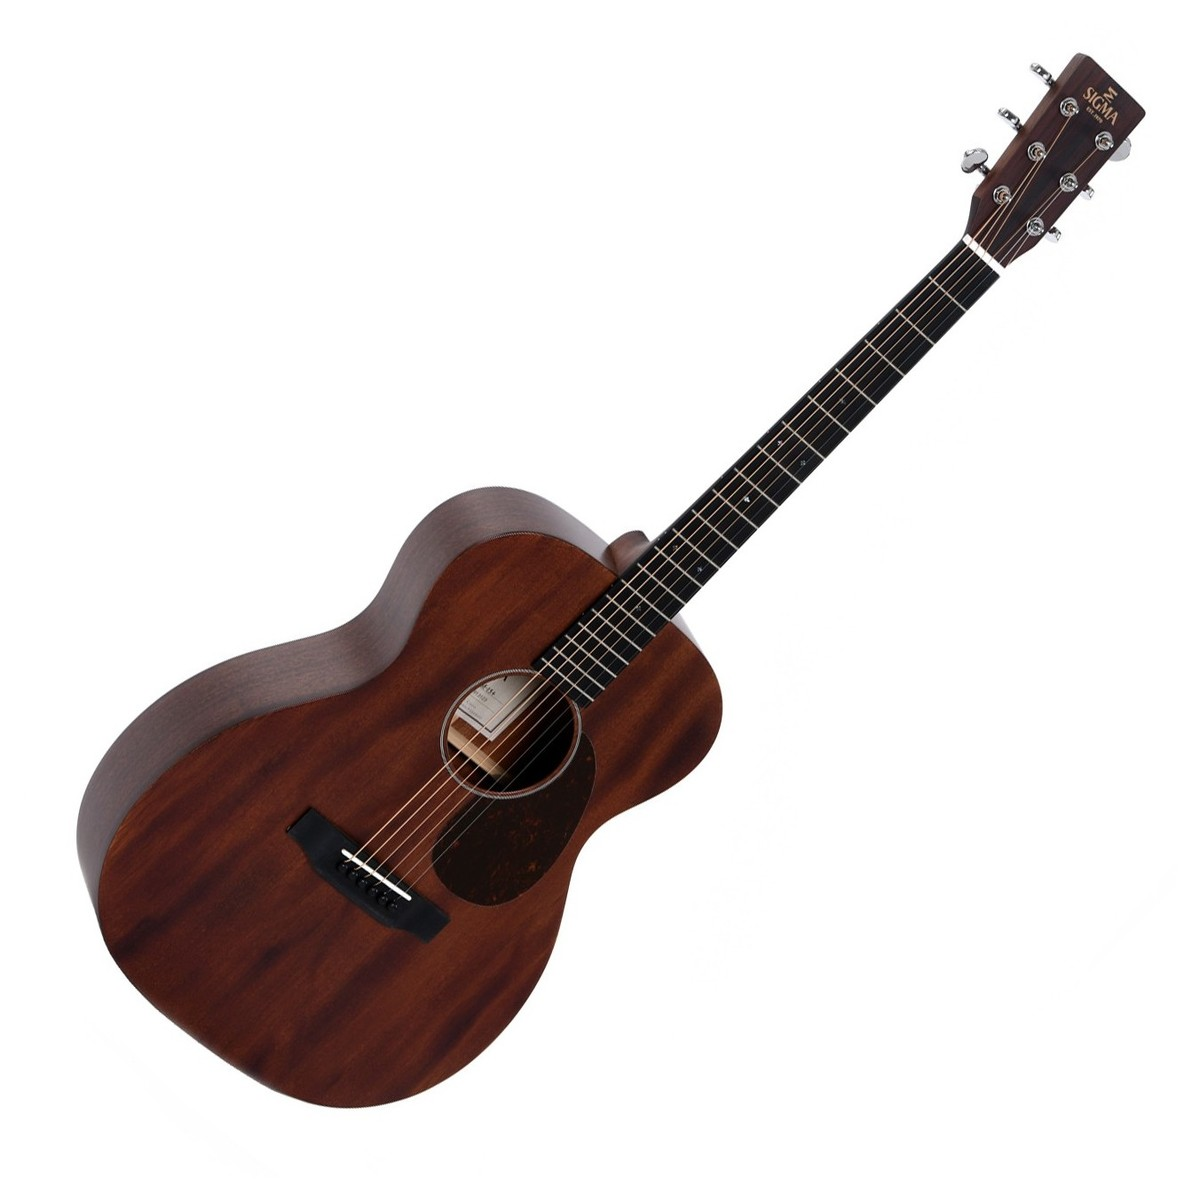 00M-15 Acoustic Guitar Mahogany: Acoustic Guitar